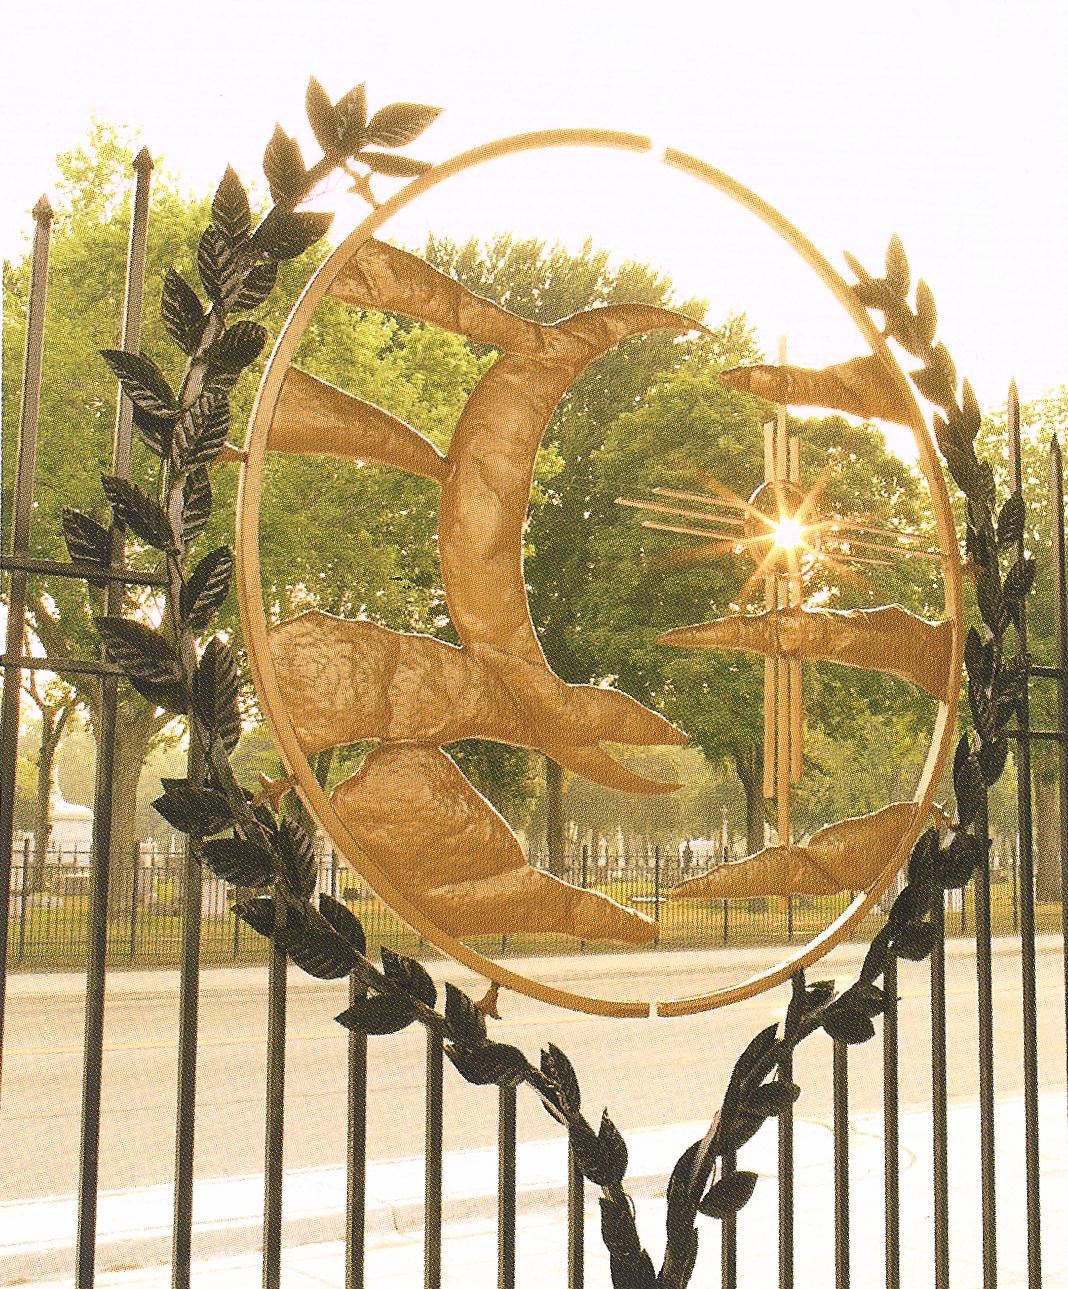 GARDEN+GATE+DETAIL-1705498149-O.jpg